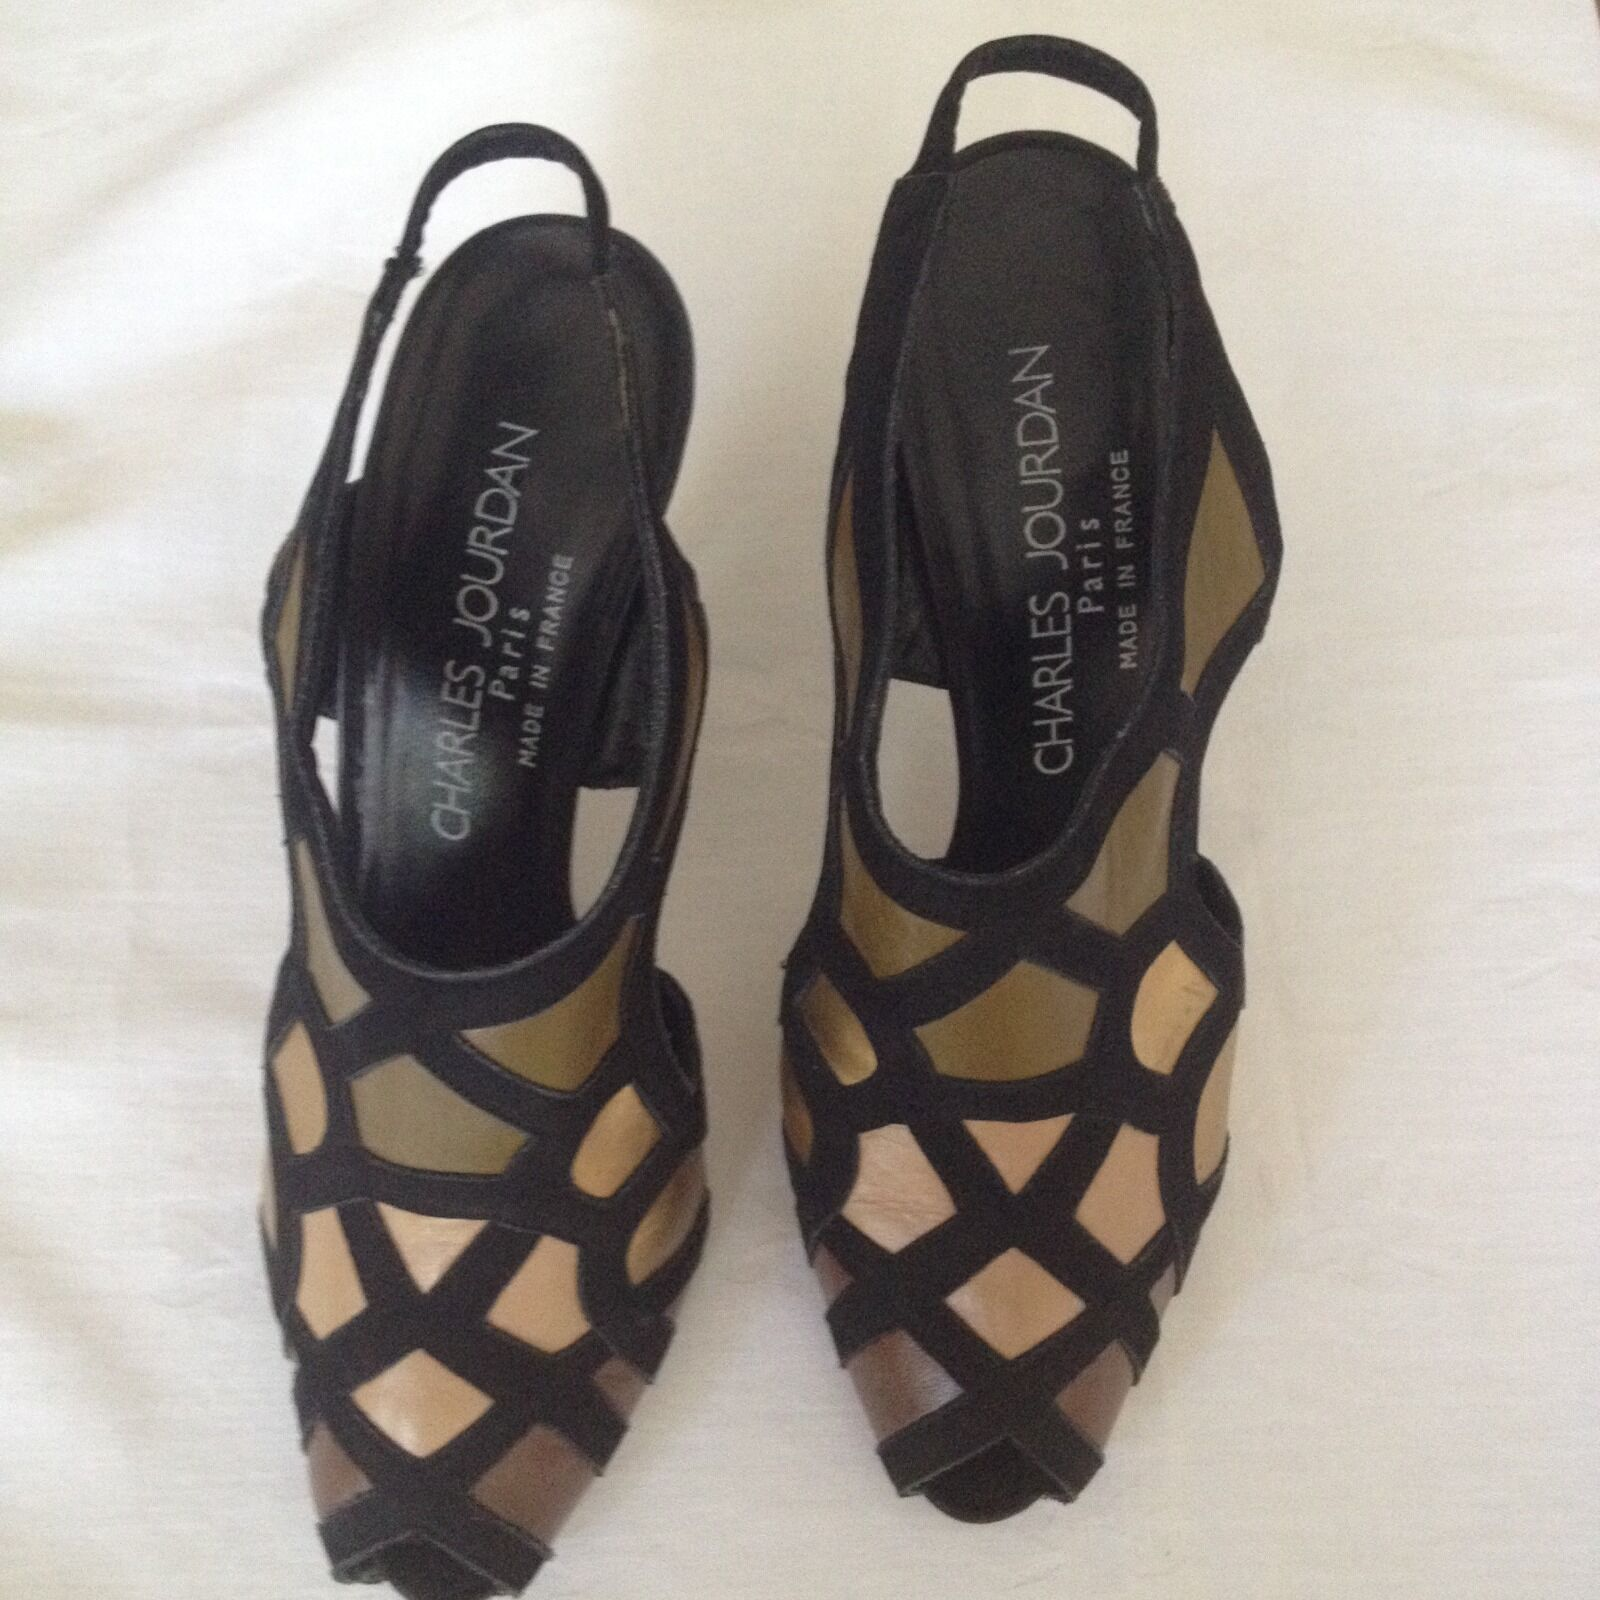 VINTAGE Charles Jourdan black khaki gold leather high heel shoes (SIZE 39)